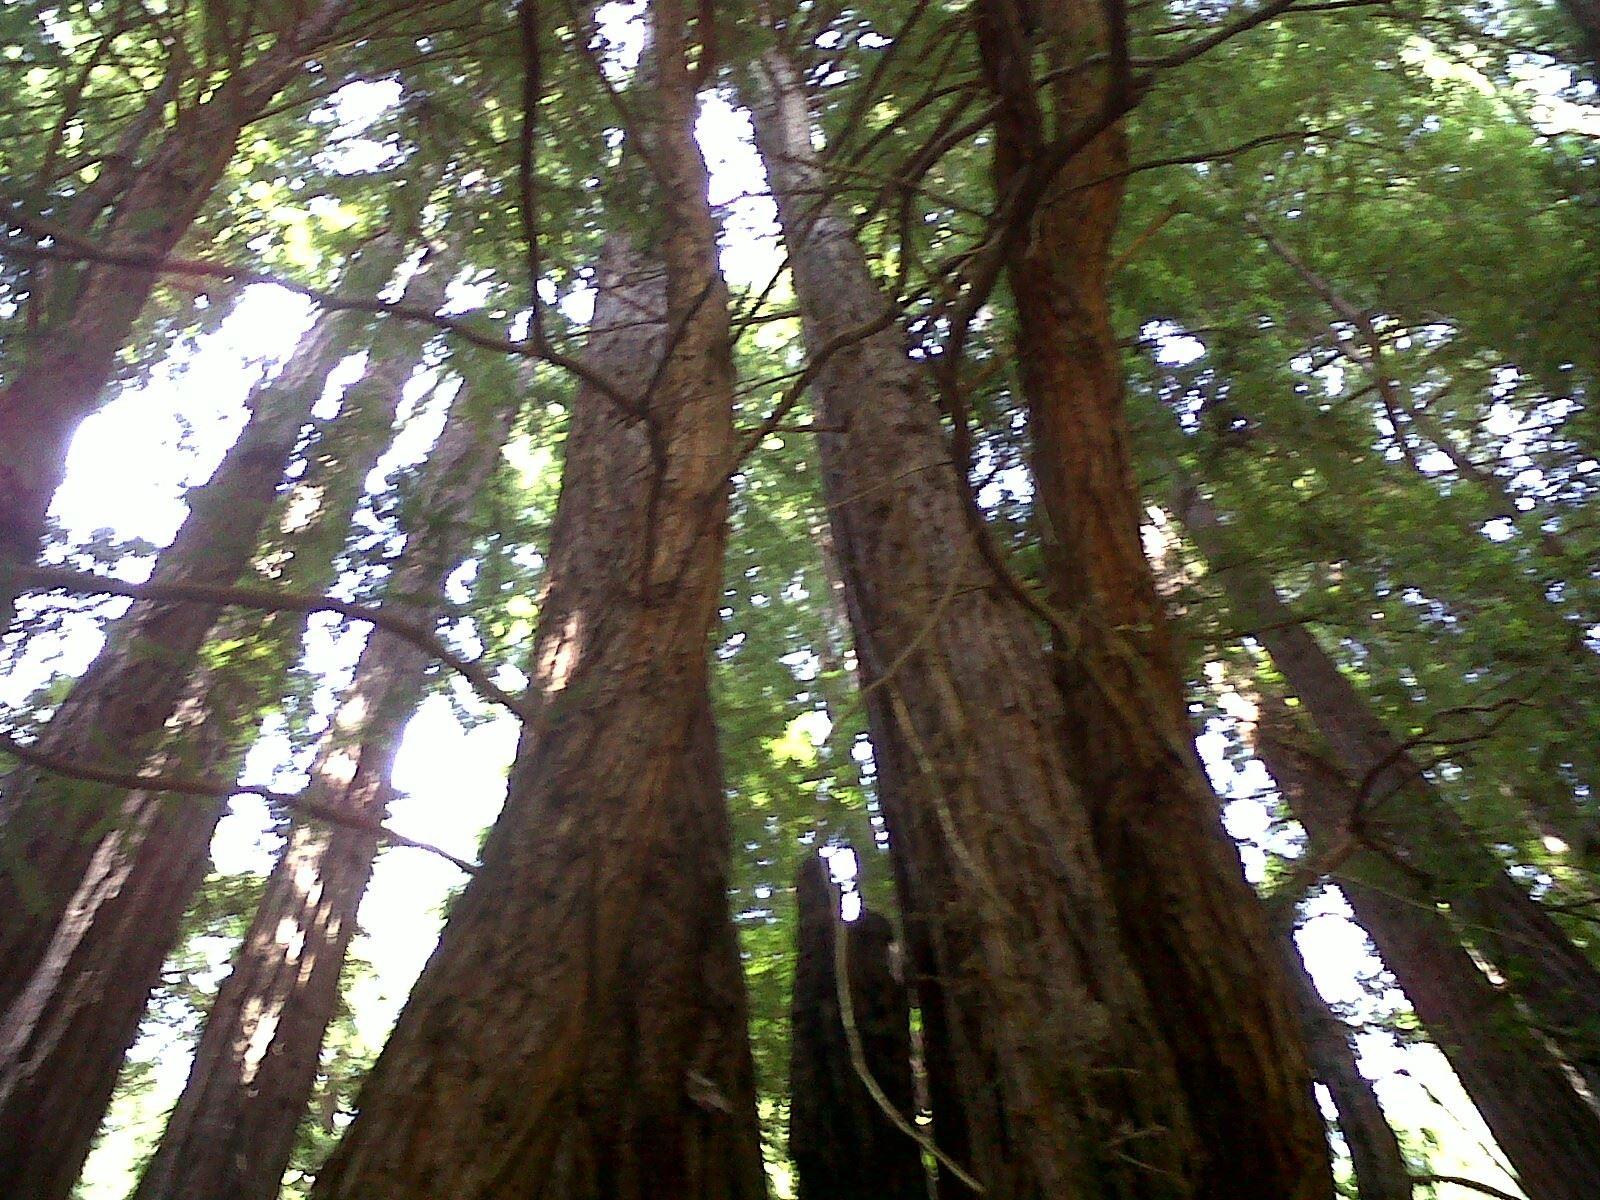 Redwoods in Muir Woods : Redwood in Muir Woods